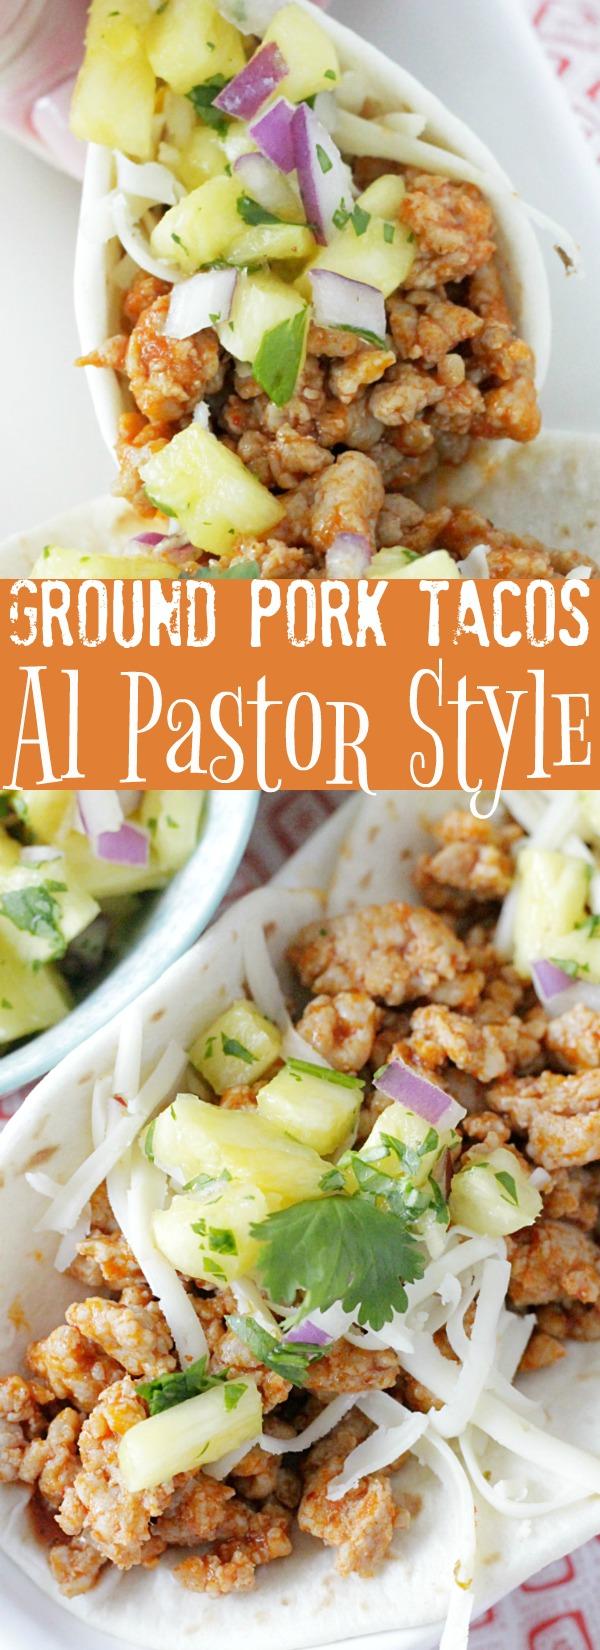 Ground Pork Tacos - Al Pastor Style | Foodtastic Mom